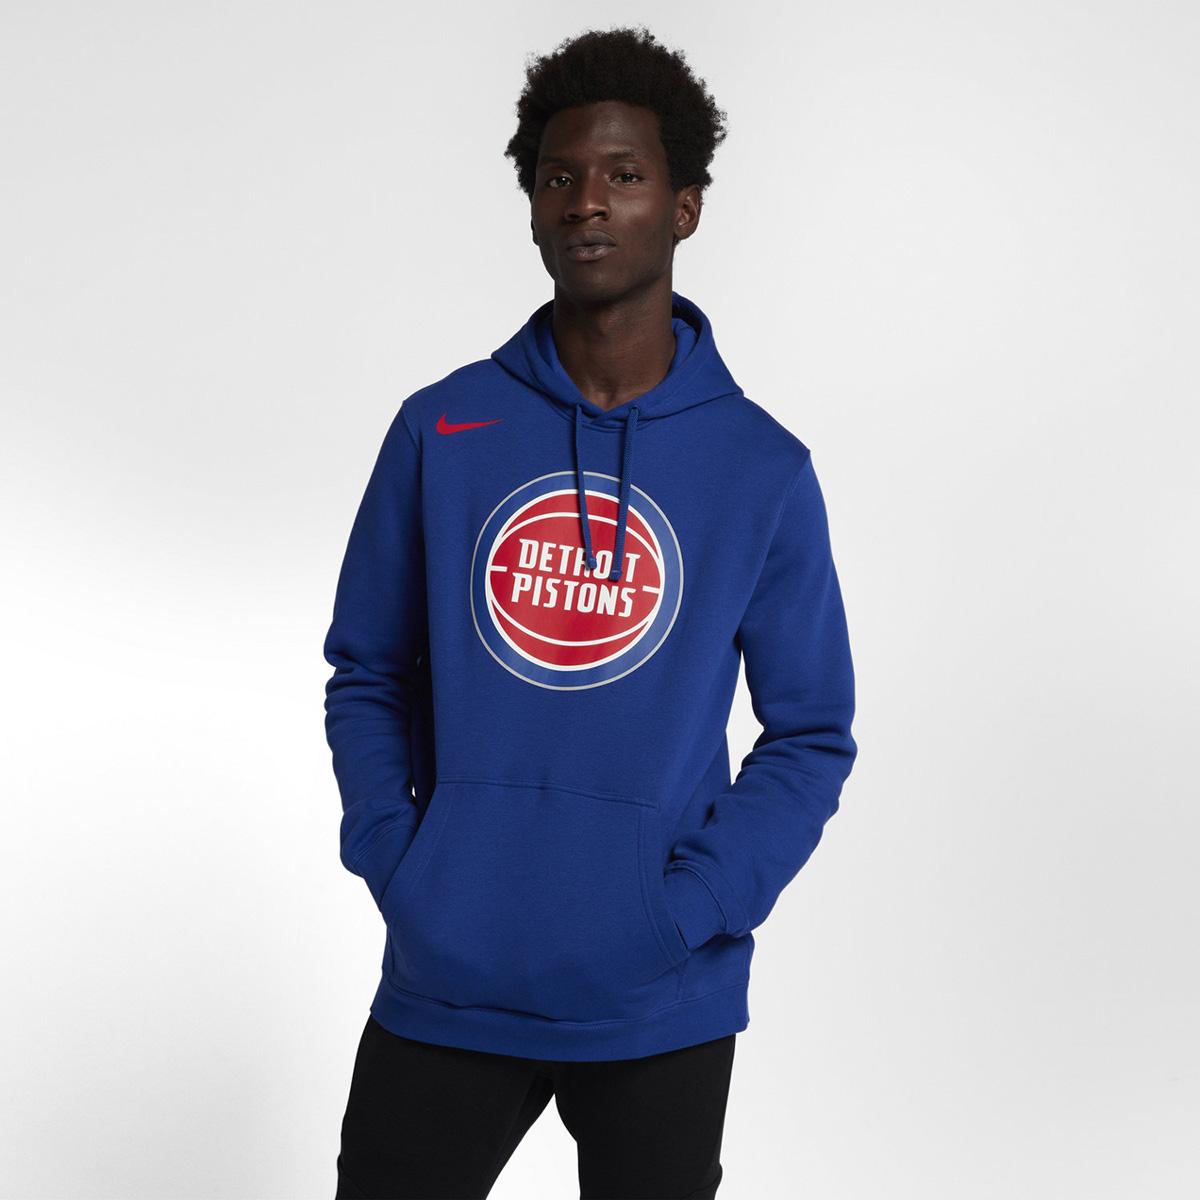 quality design 8d52d 6aa2e Nike NBA Detroit Pistons Fleece Hoodie - NBA Shop Detroit ...